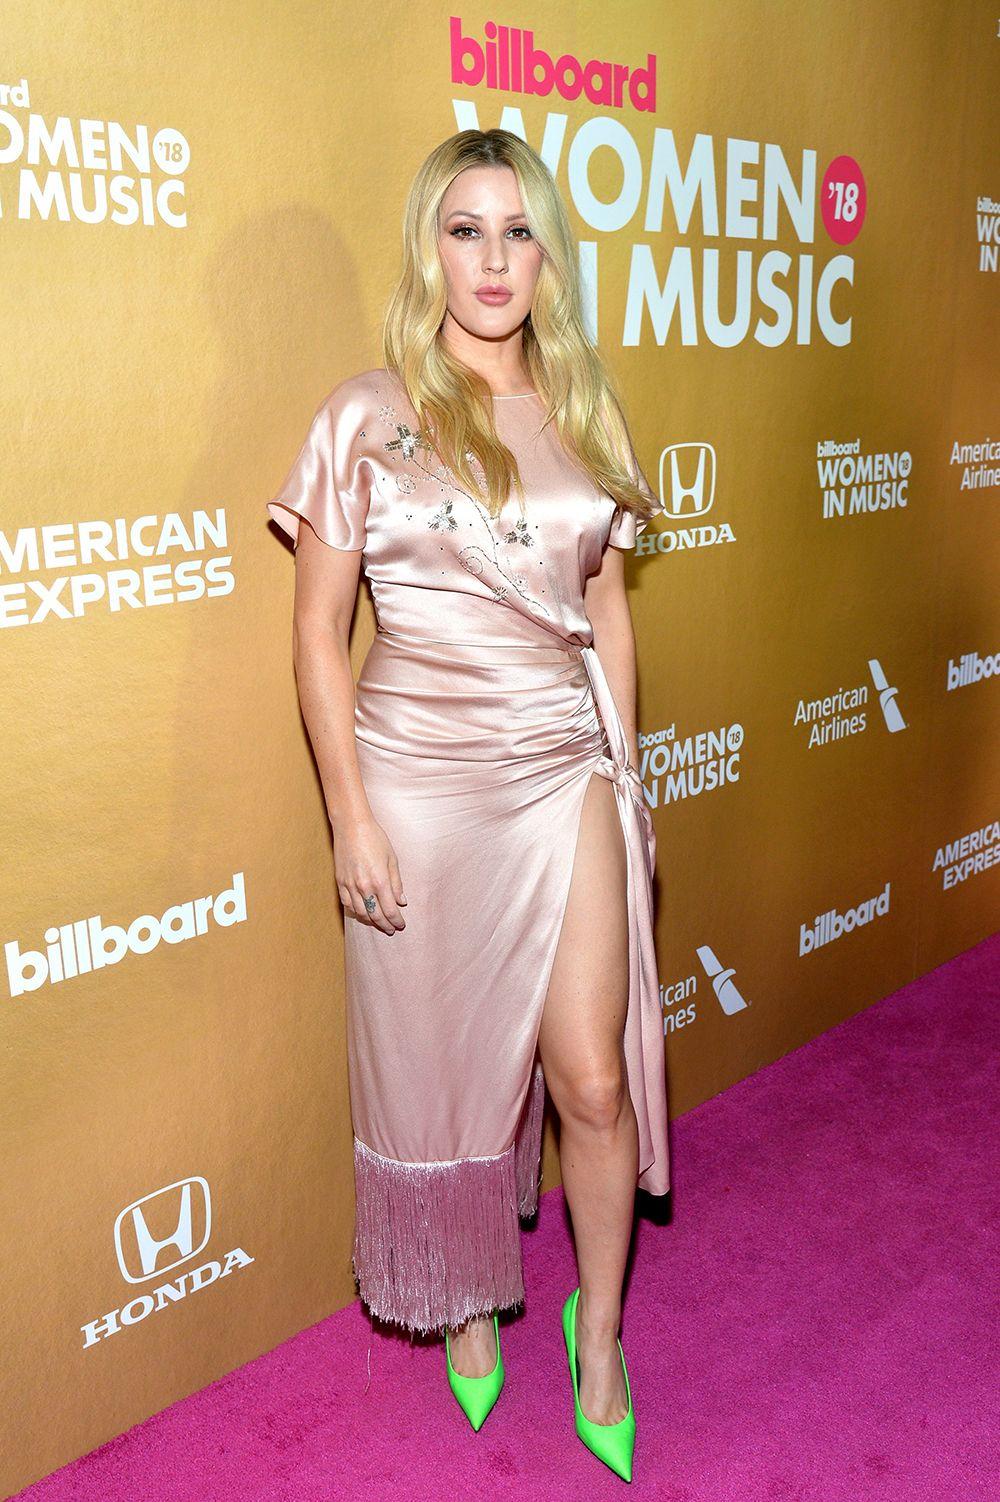 Billboard Women In Music — Red Carpet Pics